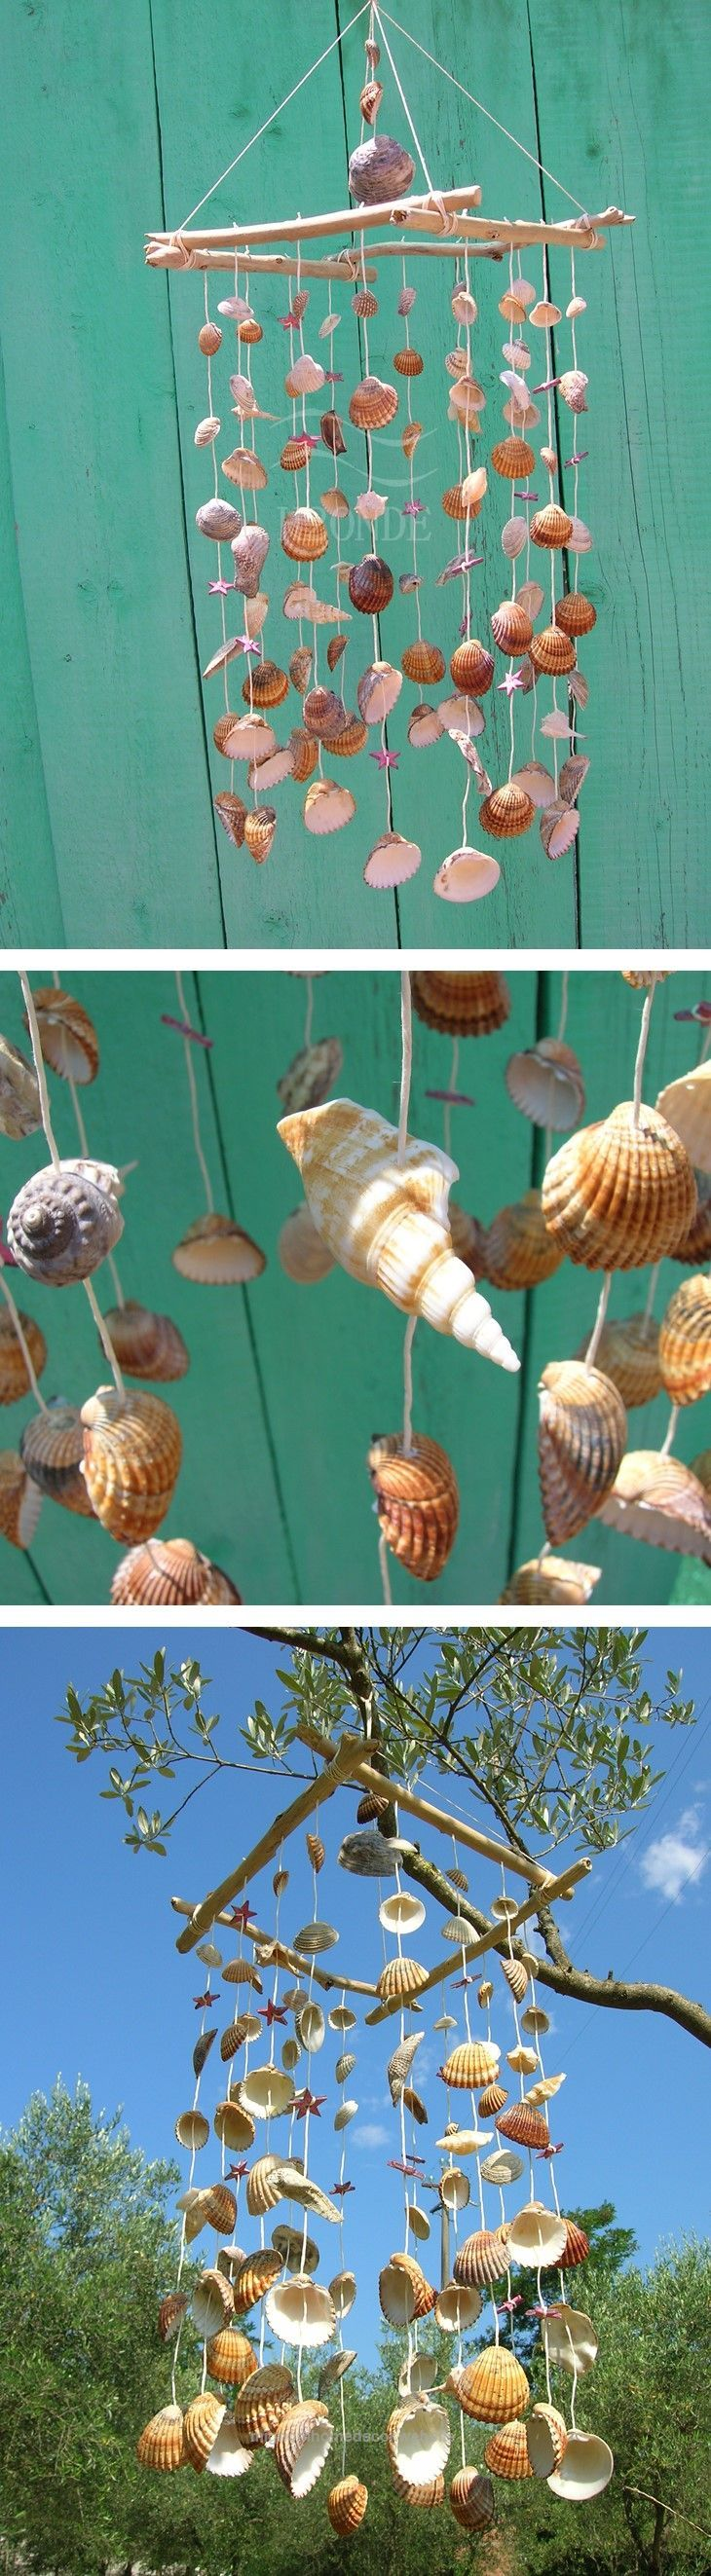 Perfect Wind chime,dream catcher,driftwood beach ocean decor,seashell,wedding beach theme, wood beach decor,door,marine,coastal,shabby chic, red star, windchime,home decor natural ocean art. Acc ..